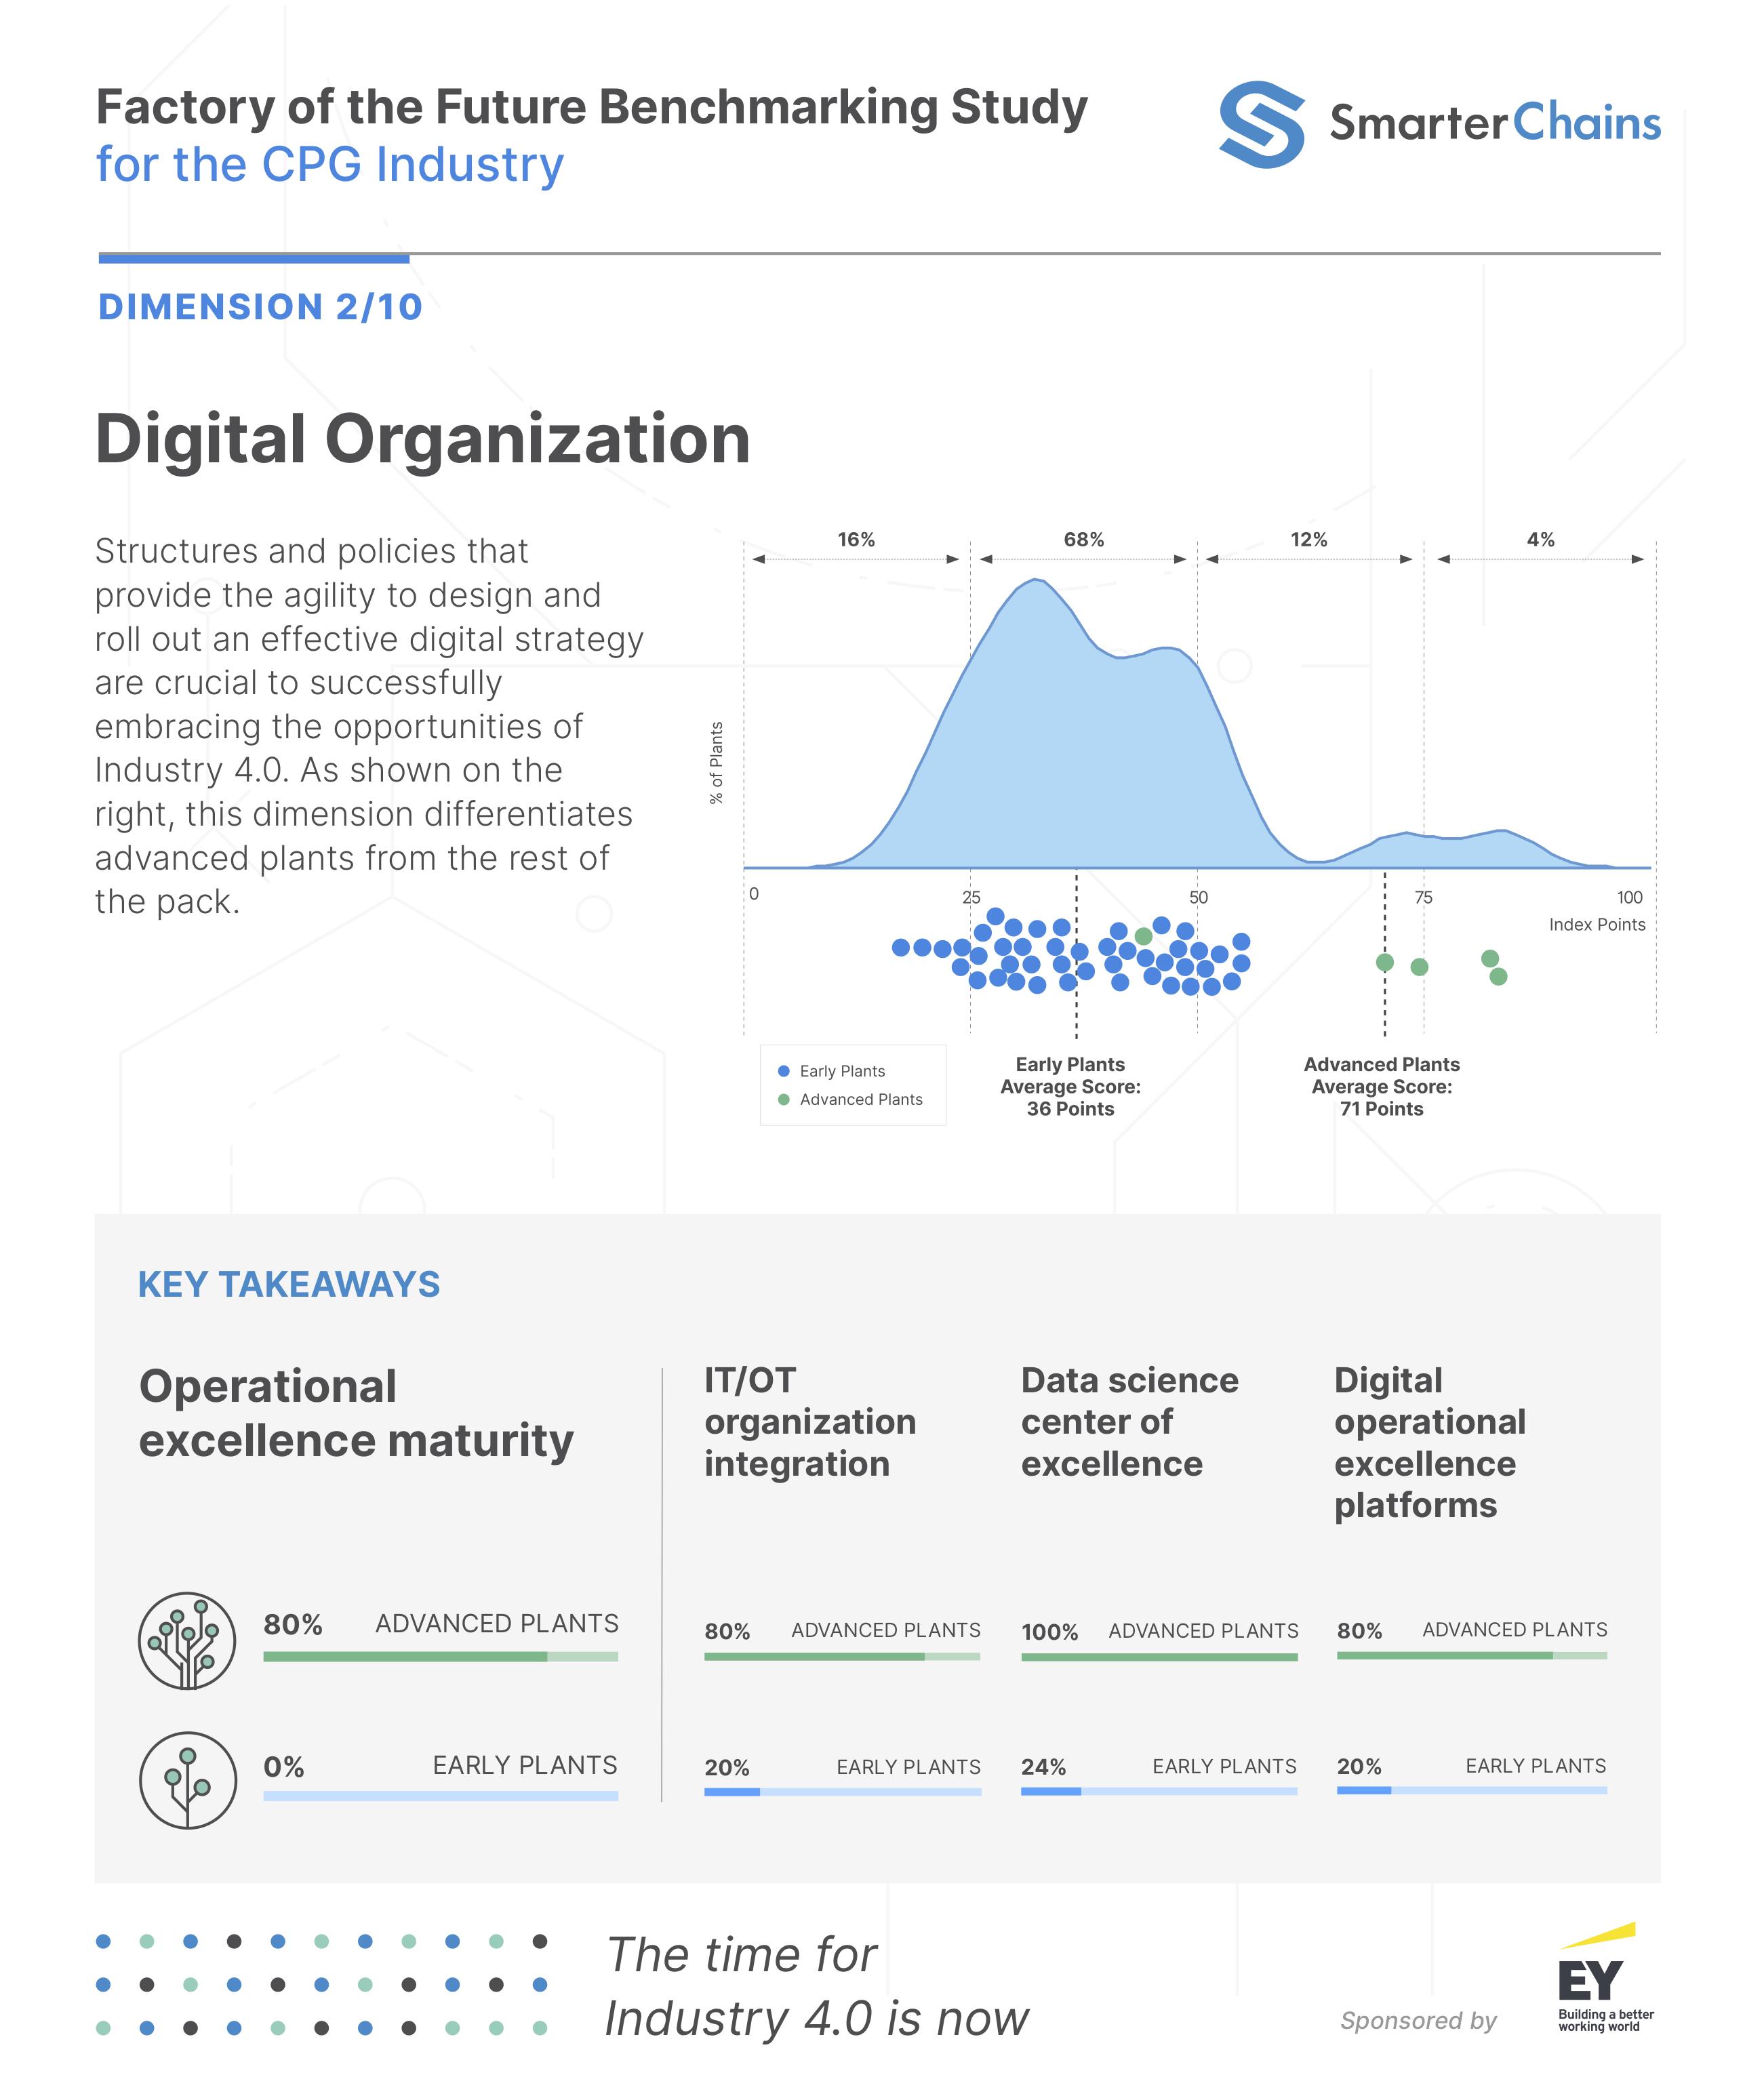 digital-organization.png